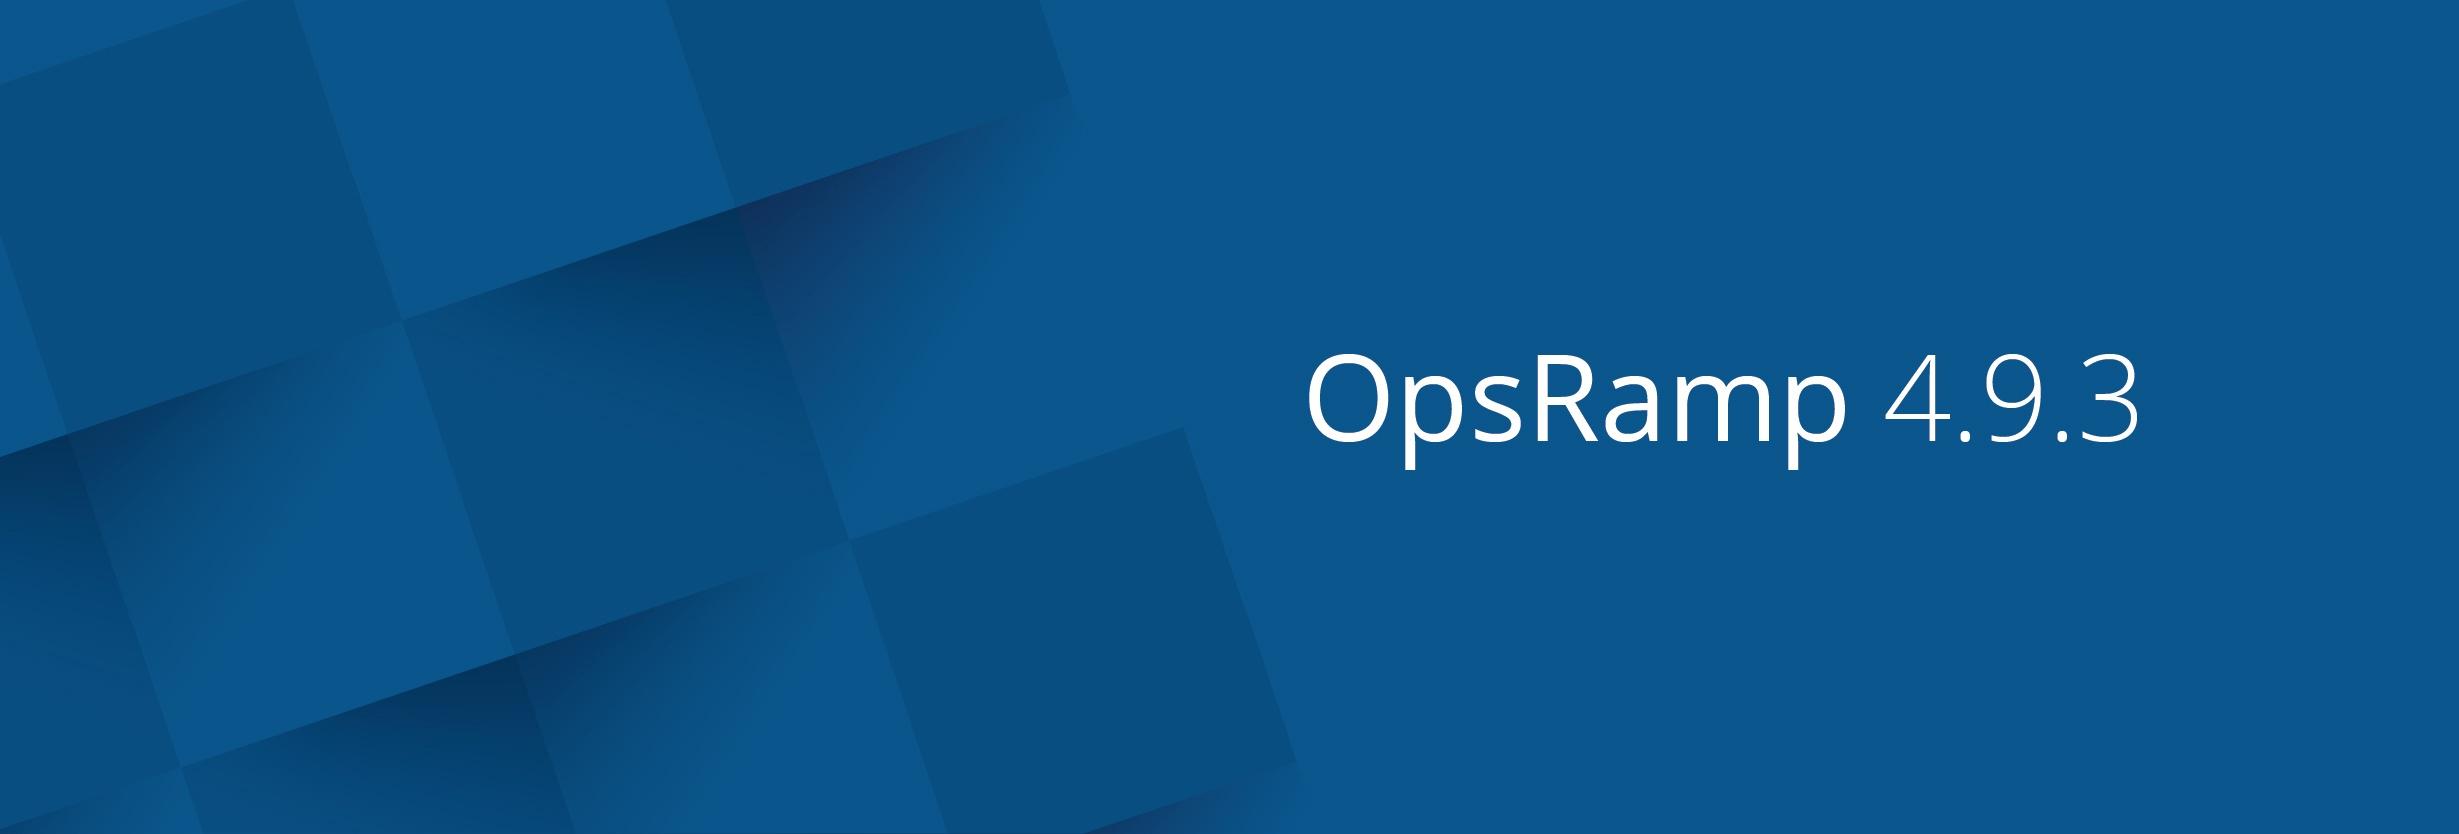 OpsRamp Platform Updates: Alert Management, RBAC, and Integrations